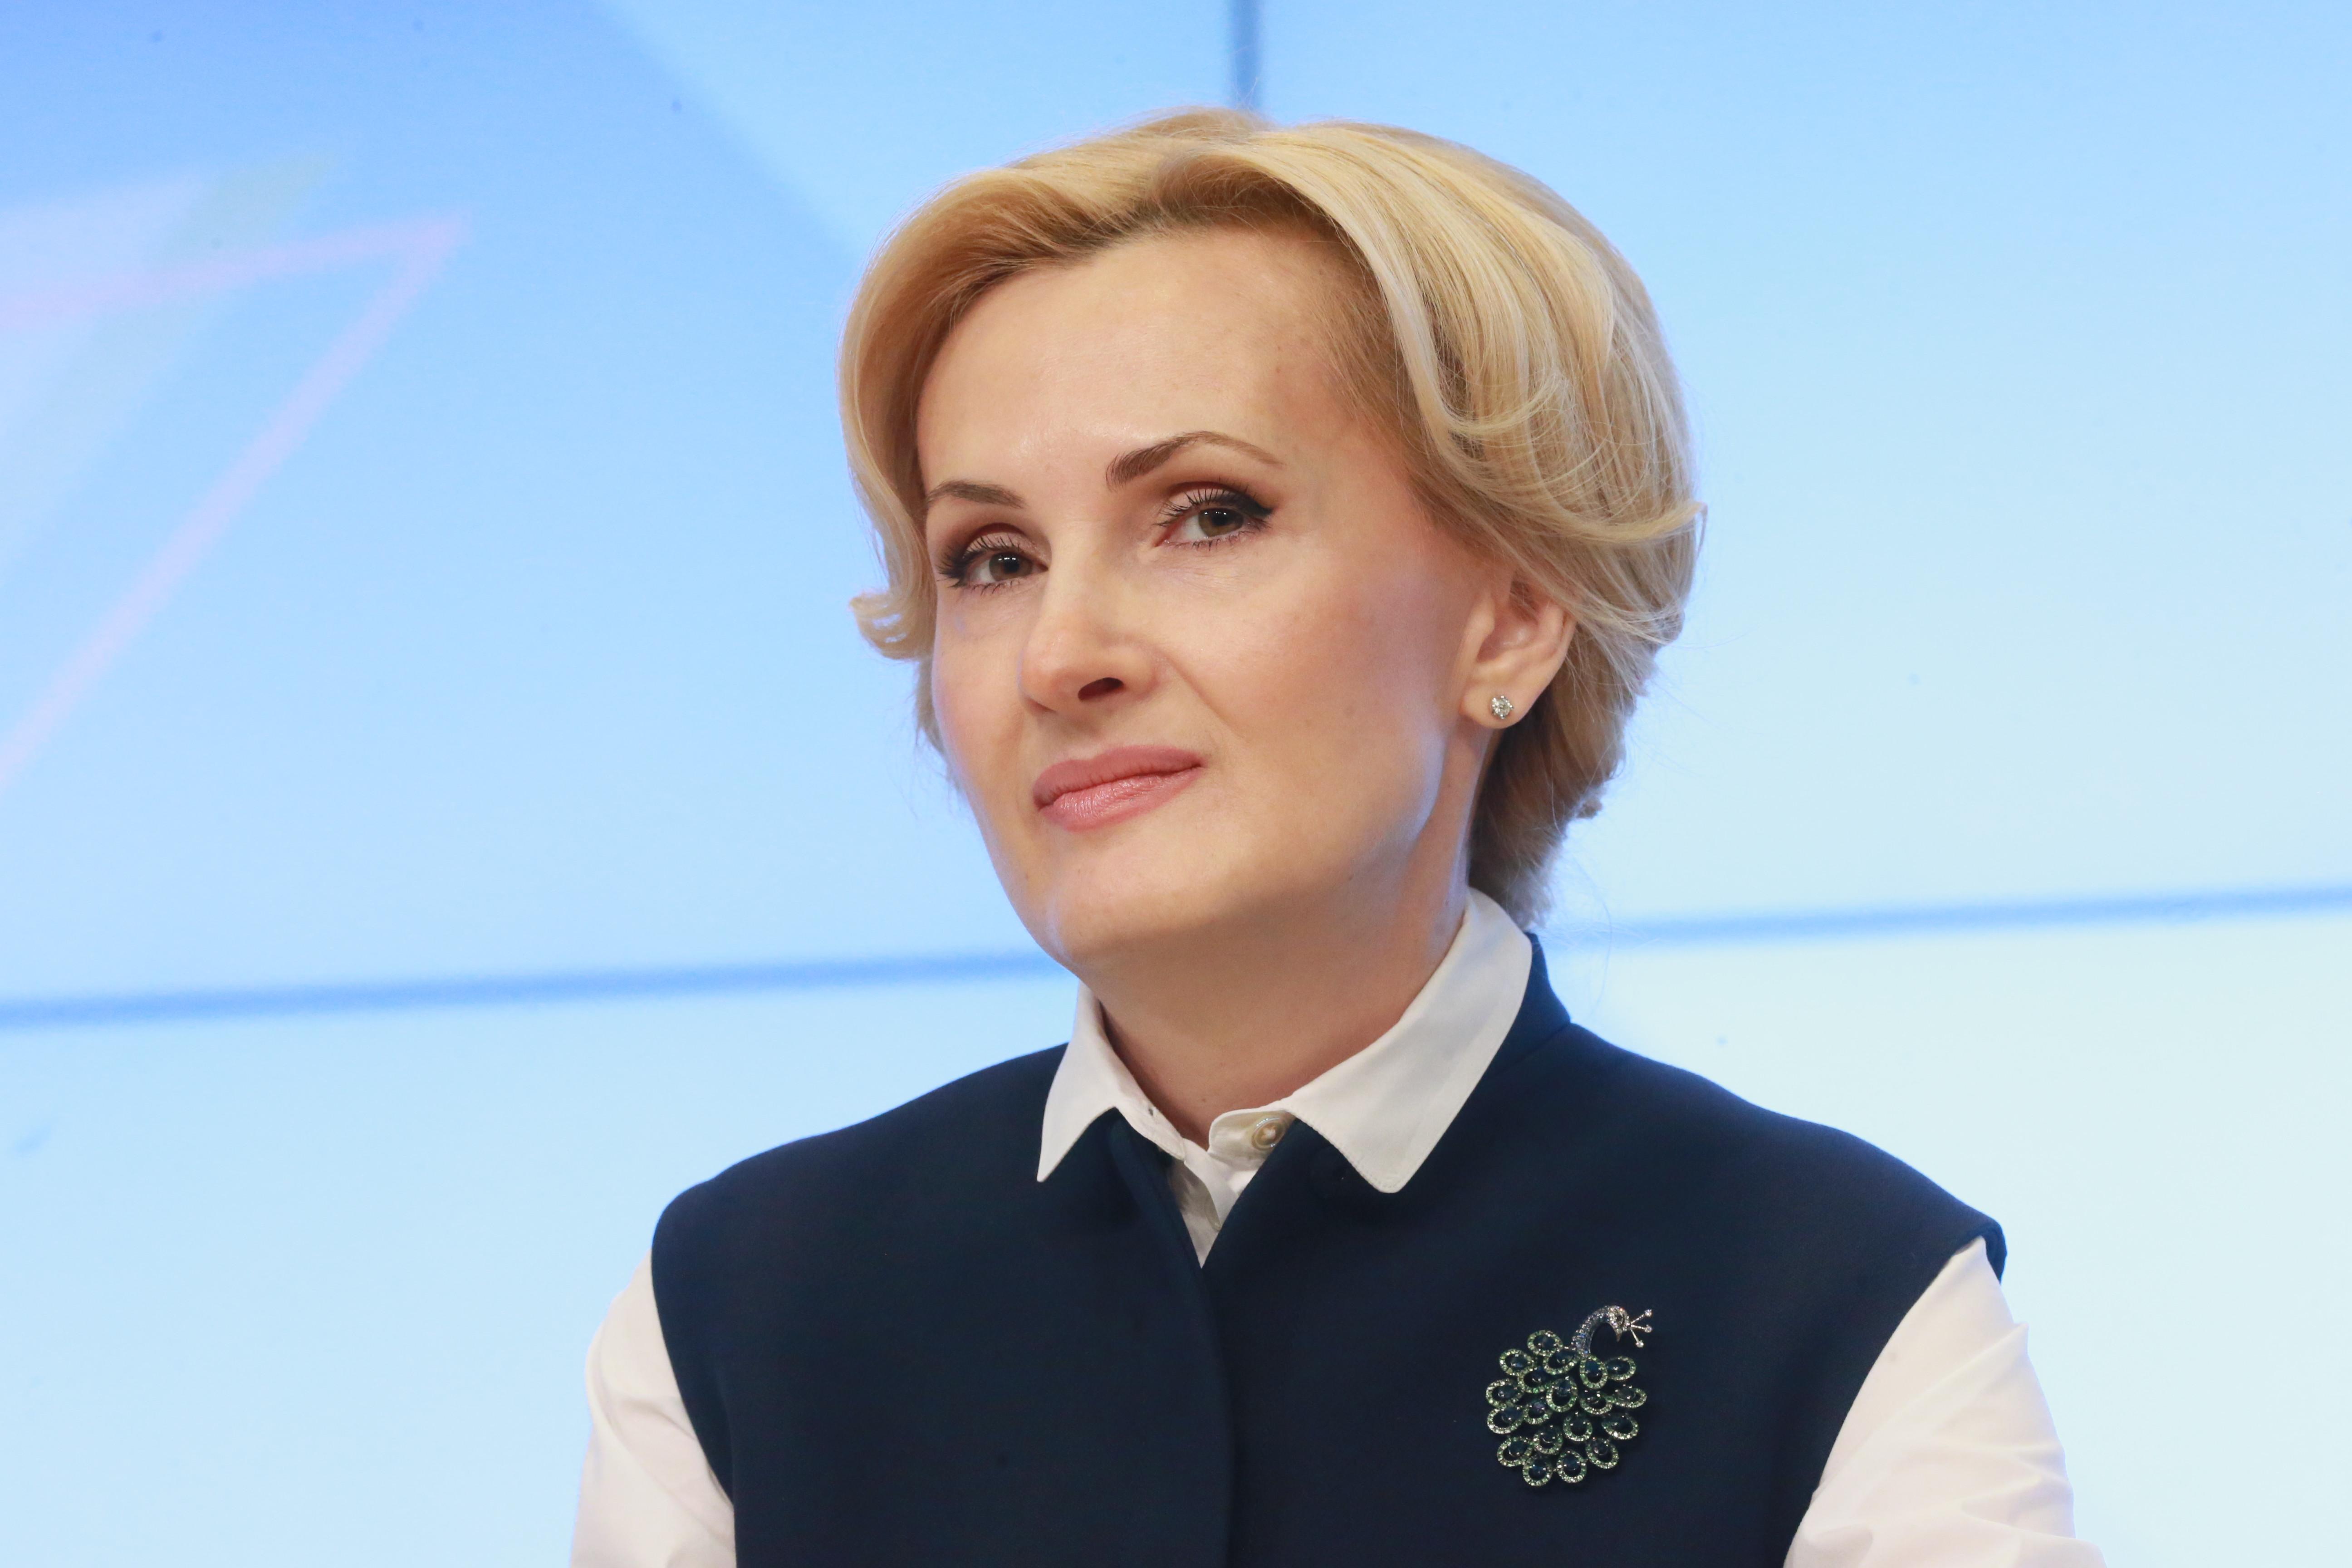 <p>Заместитель председателя Госдумы Ирина Яровая. Фото: &copy; РИА Новости/Александр Натрускин</p>